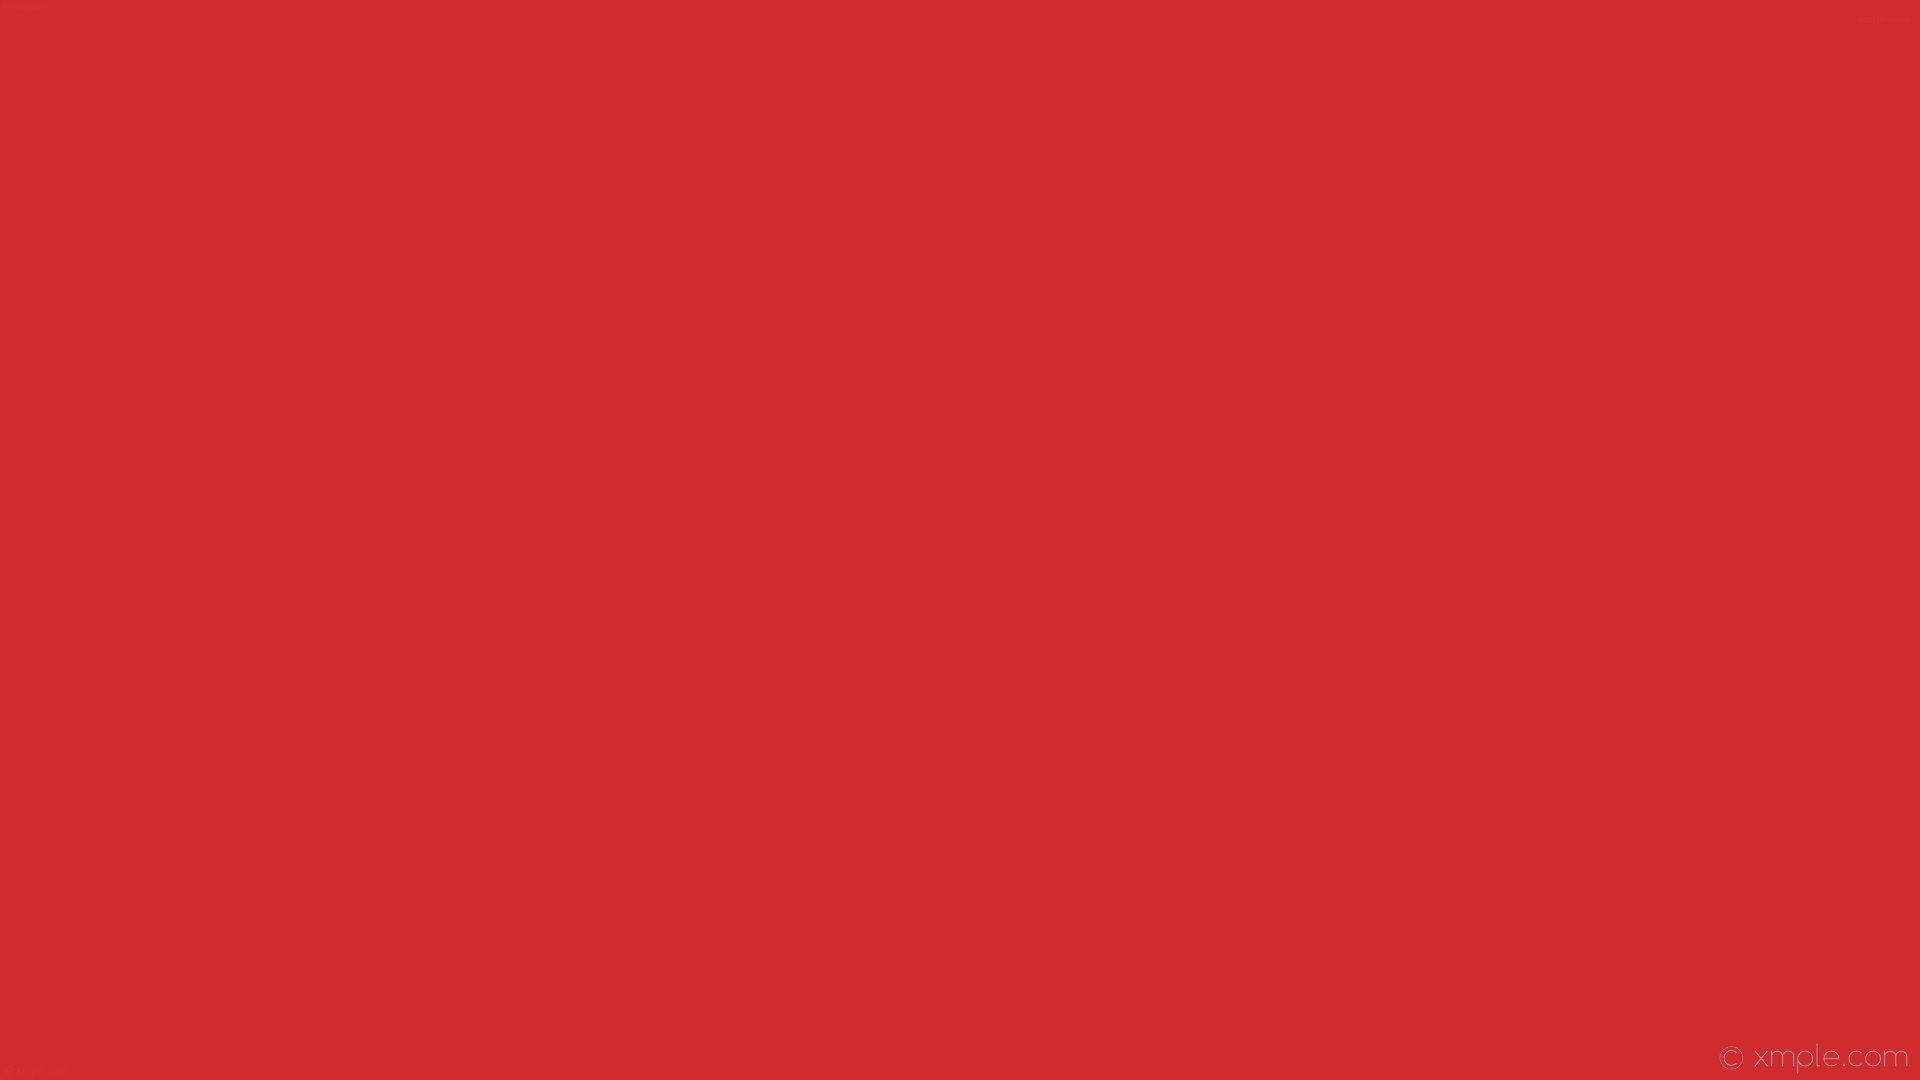 Wallpaper plain one colour single solid color red #d02c2f